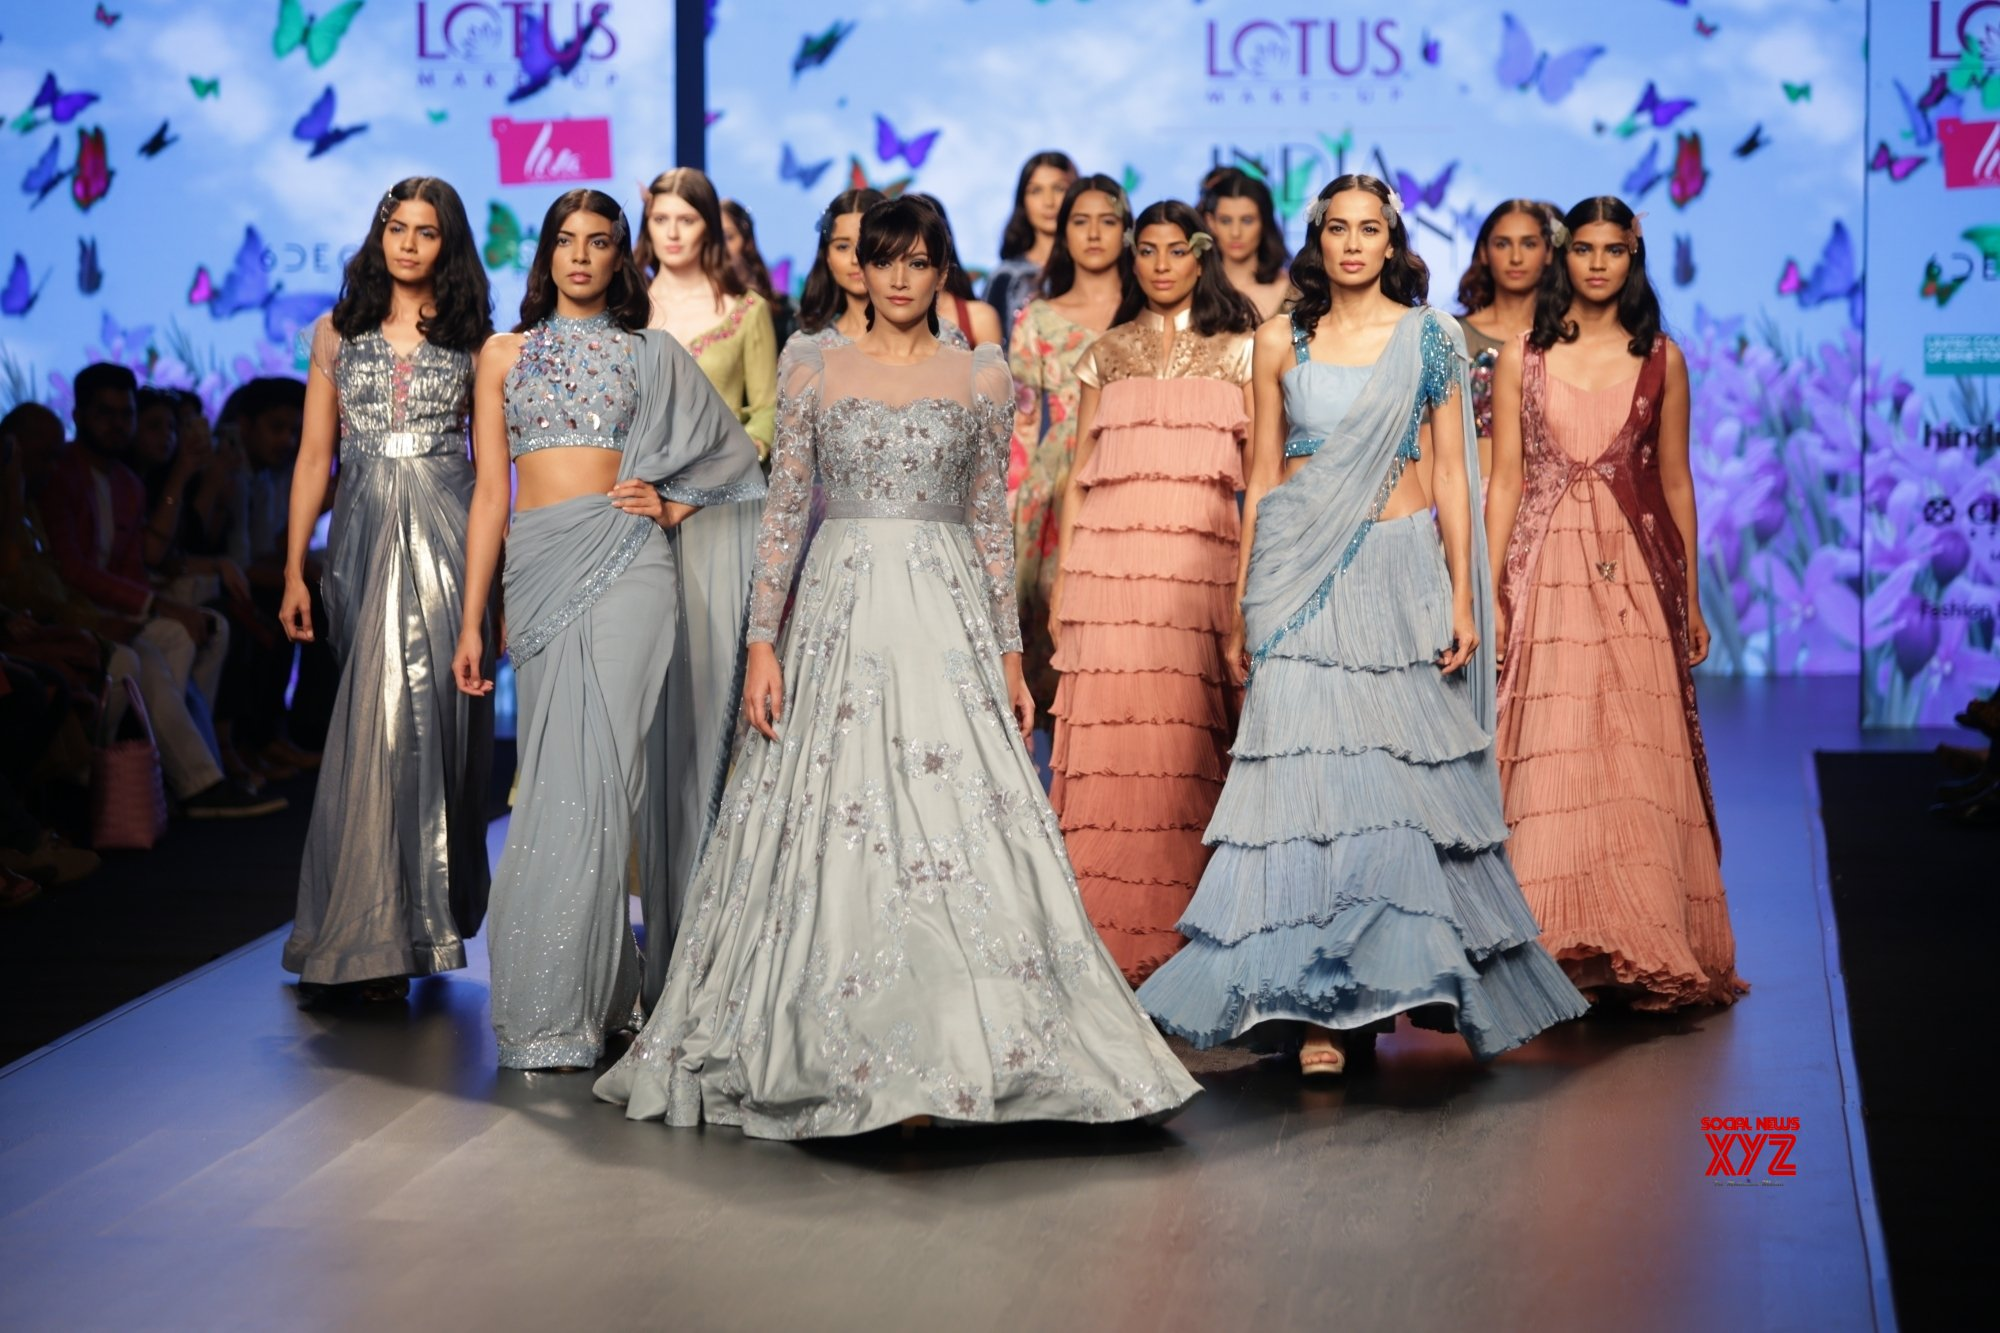 New Delhi: Lotus India Fashion Week - Day 4 - Karishma Deepa Sondhi (Batch - 5) #Gallery